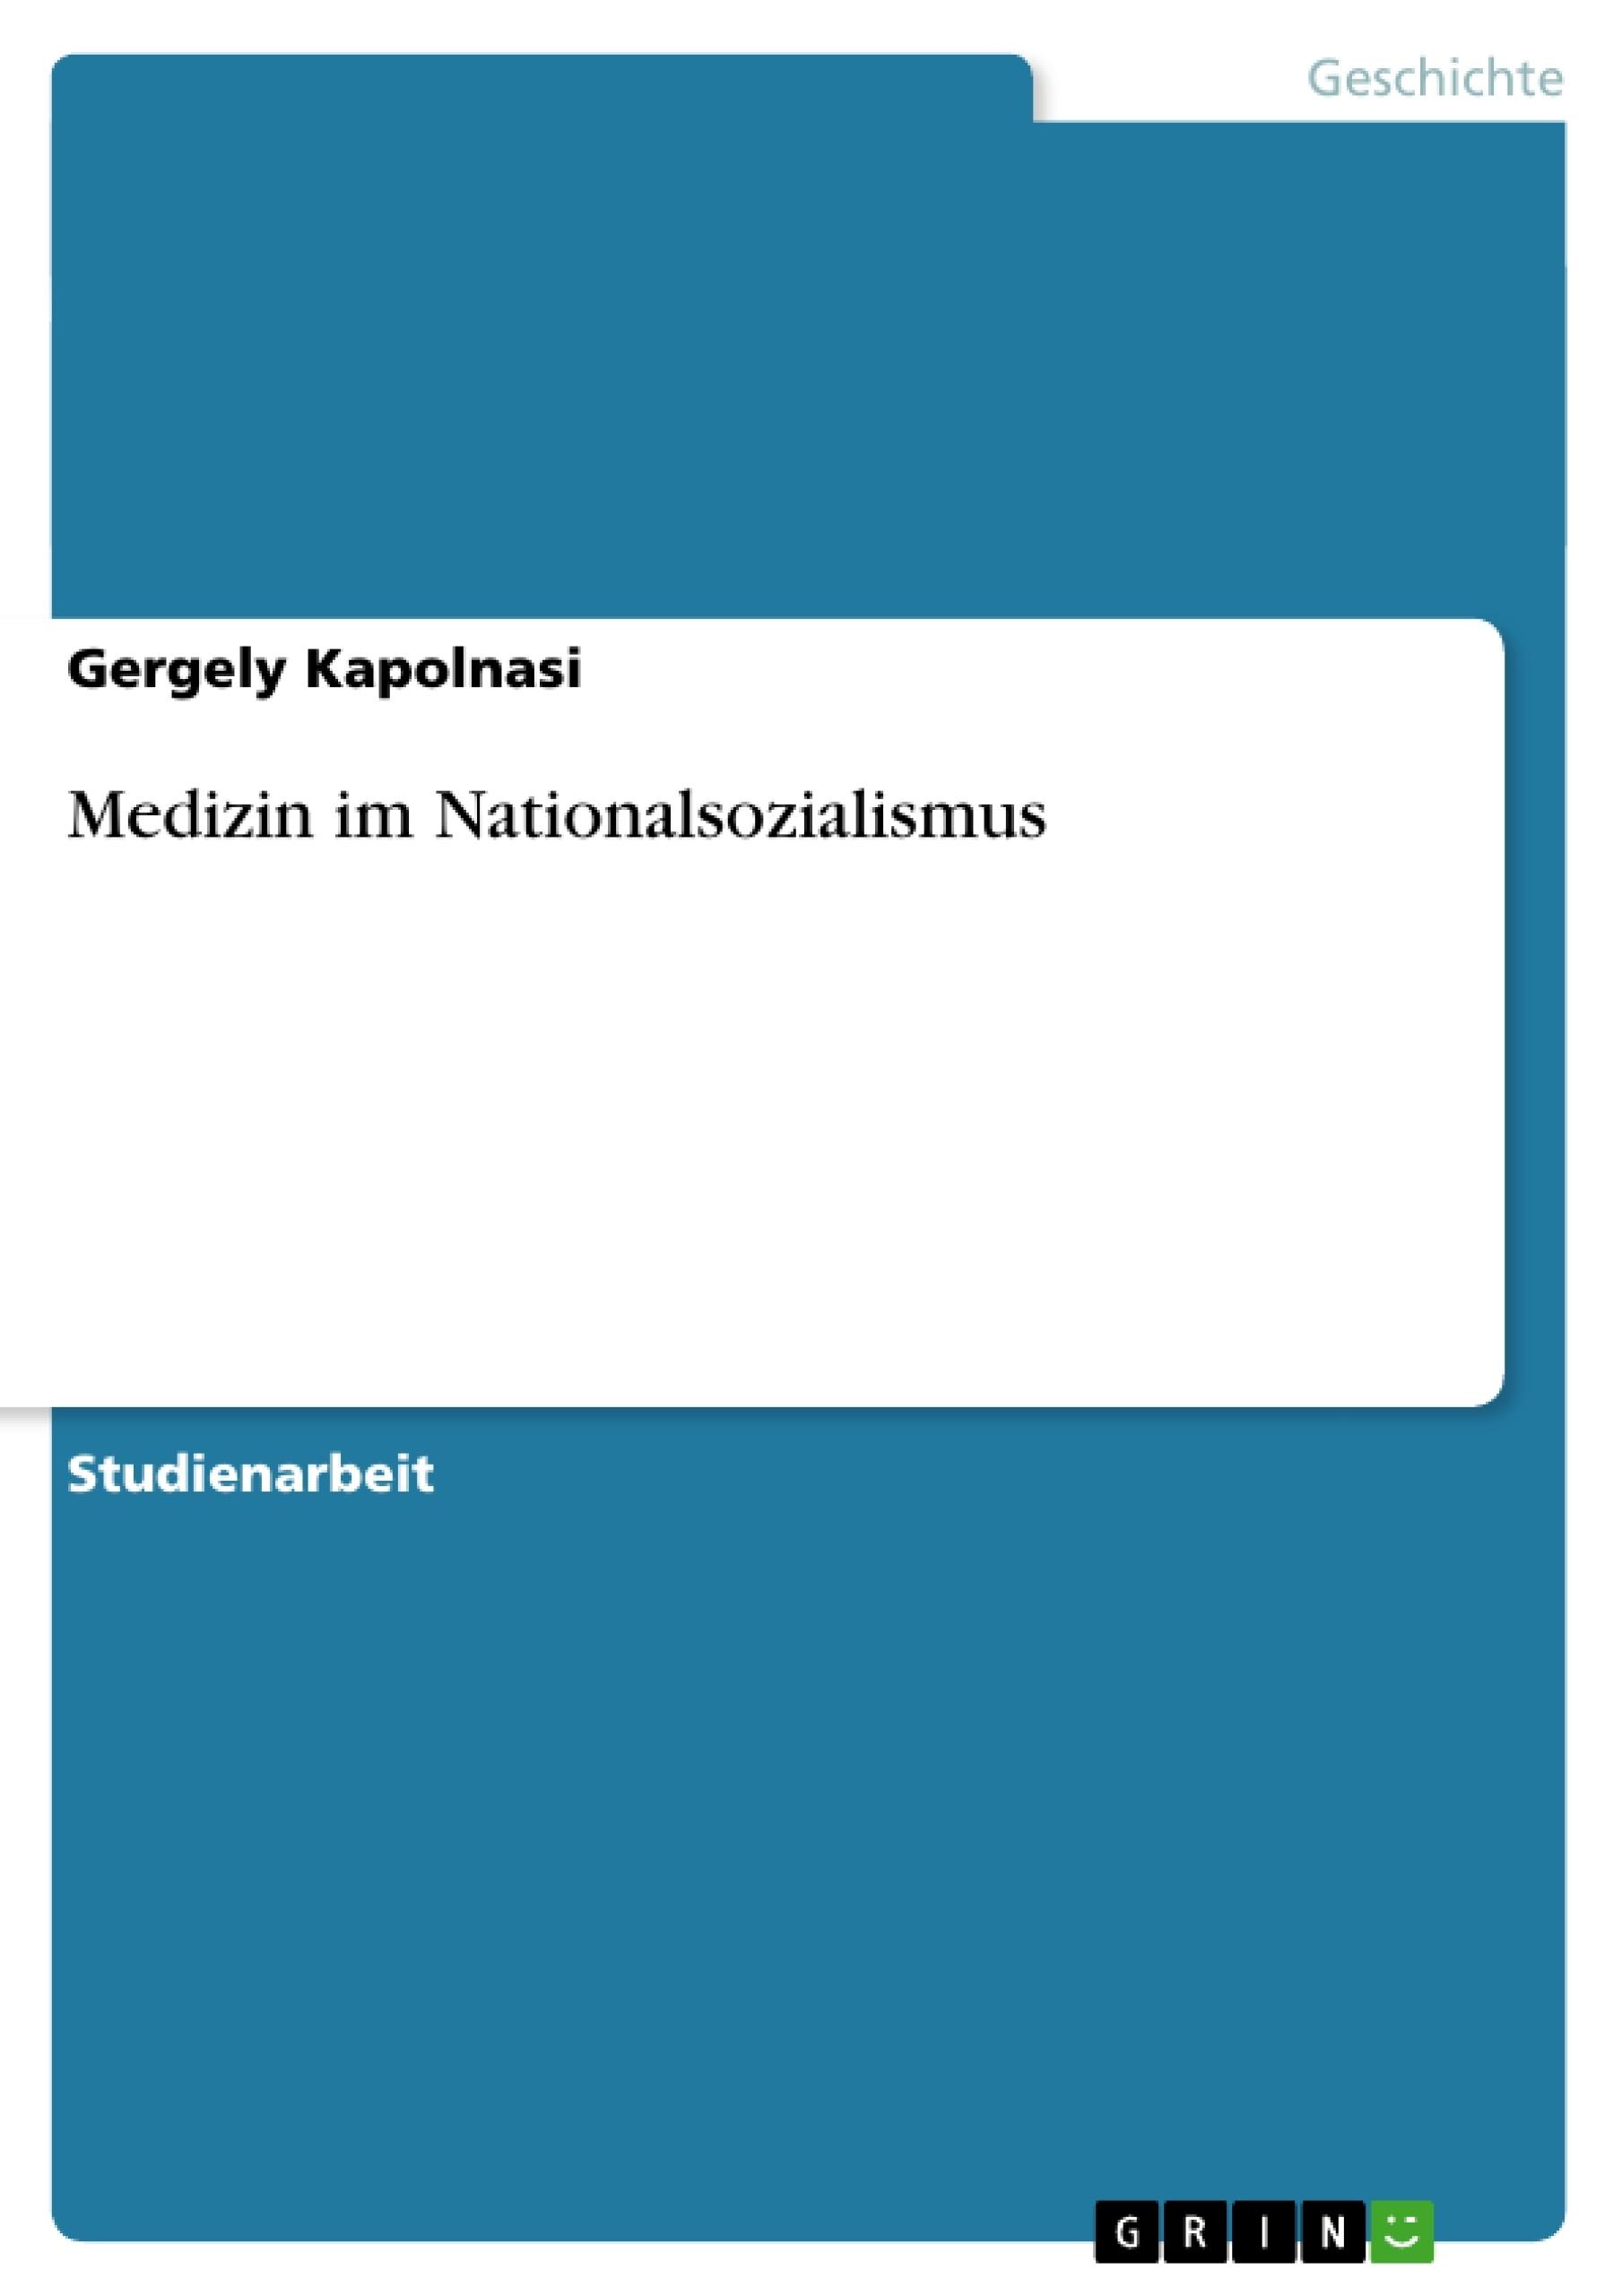 Titel: Medizin im Nationalsozialismus